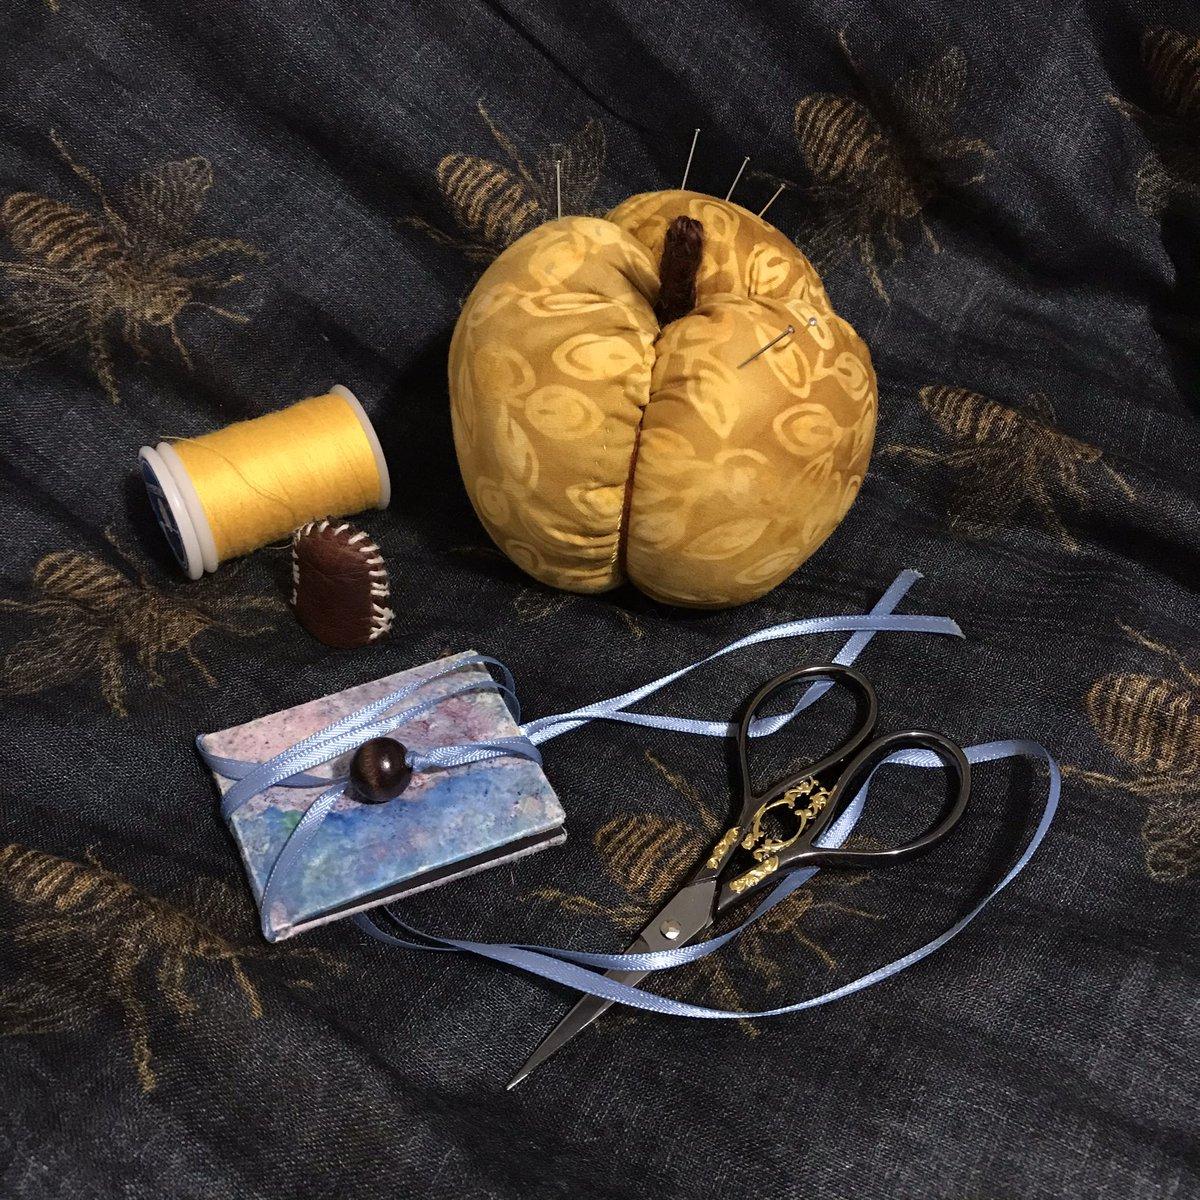 Finally figured out the mock-apple pincushion pattern! (Also: sneak peek of Aunt Lorenza's sewing kit) #FanArt #TheOuterWorlds